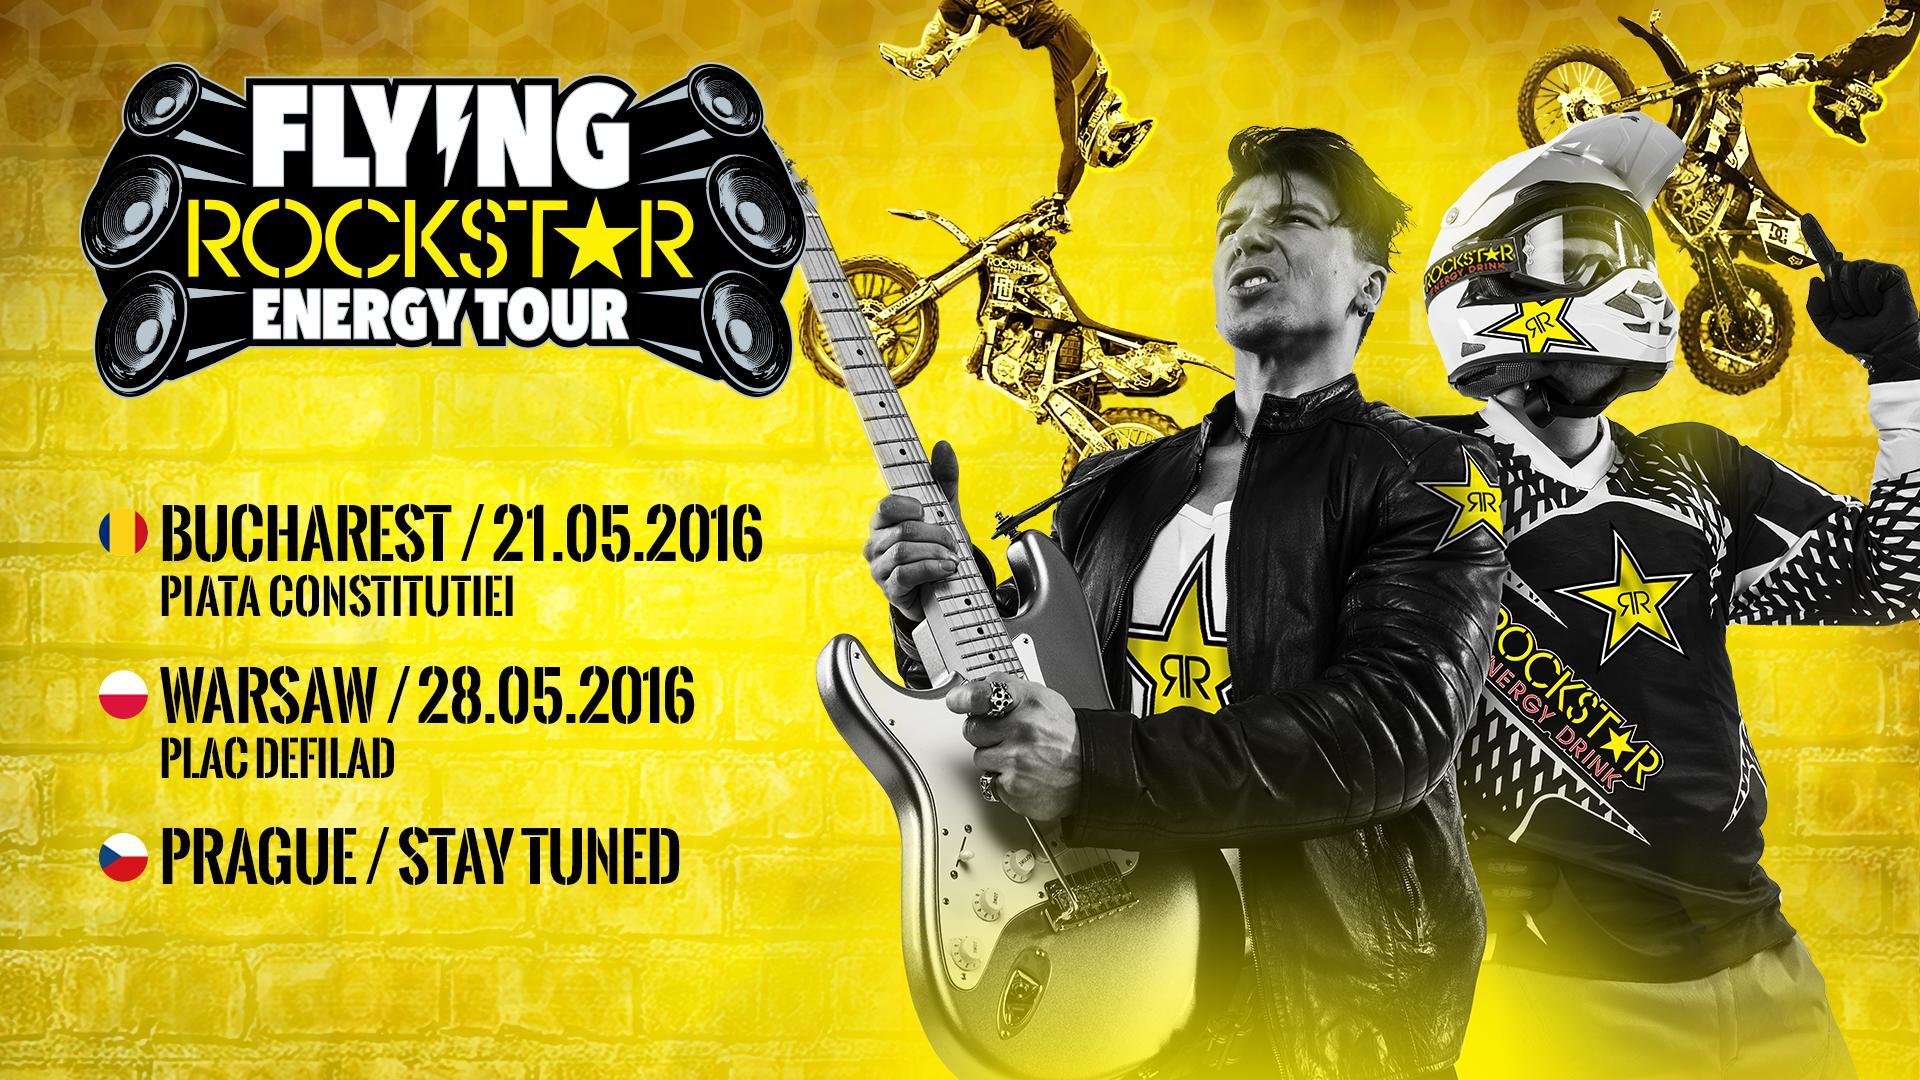 Flying Rockstar Energy Tour 2016 - Poland